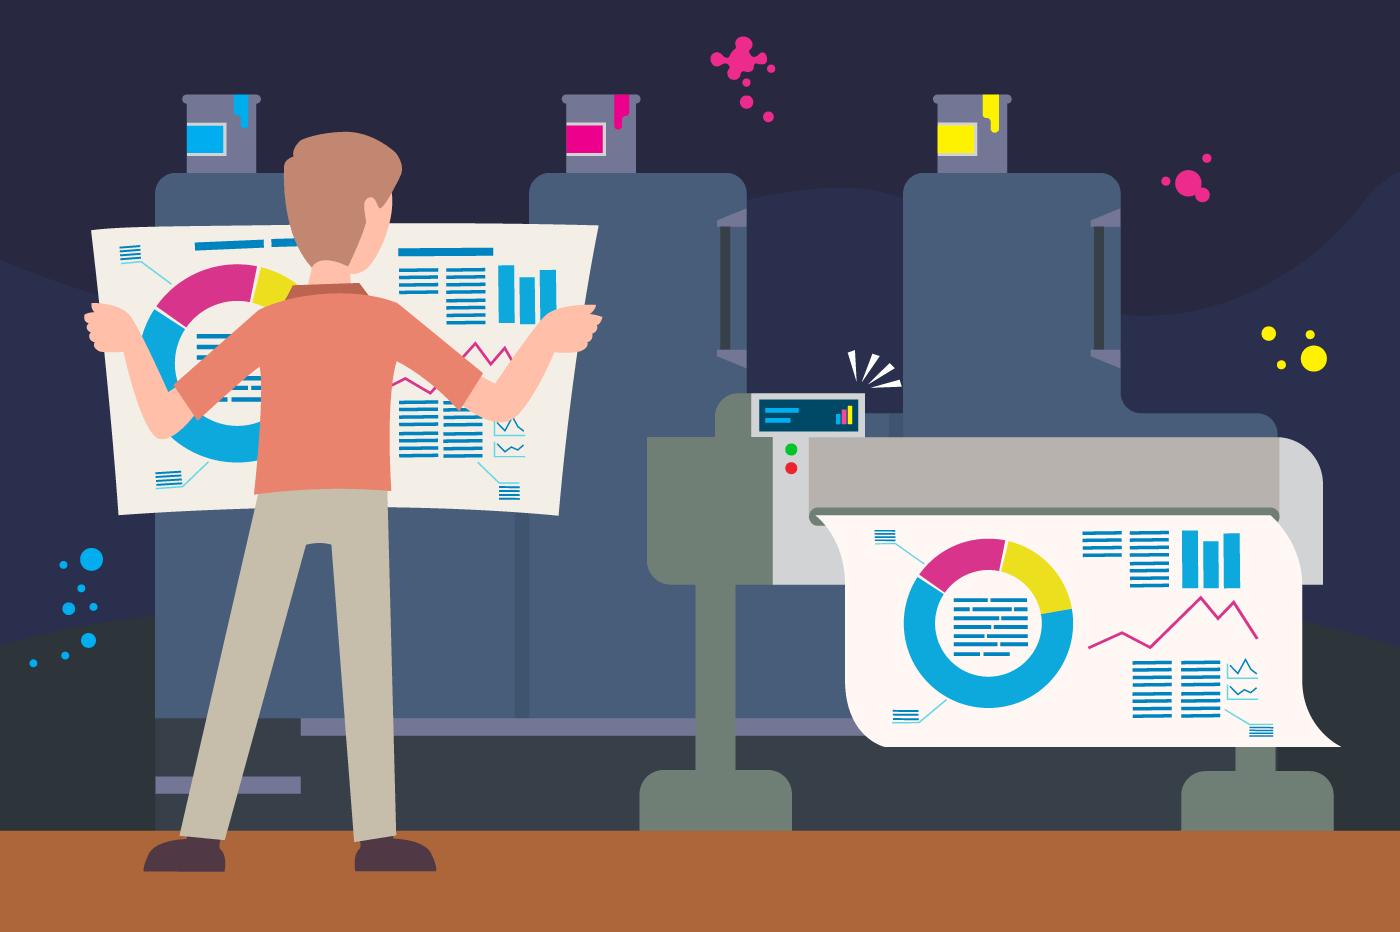 Guy print graph on printer